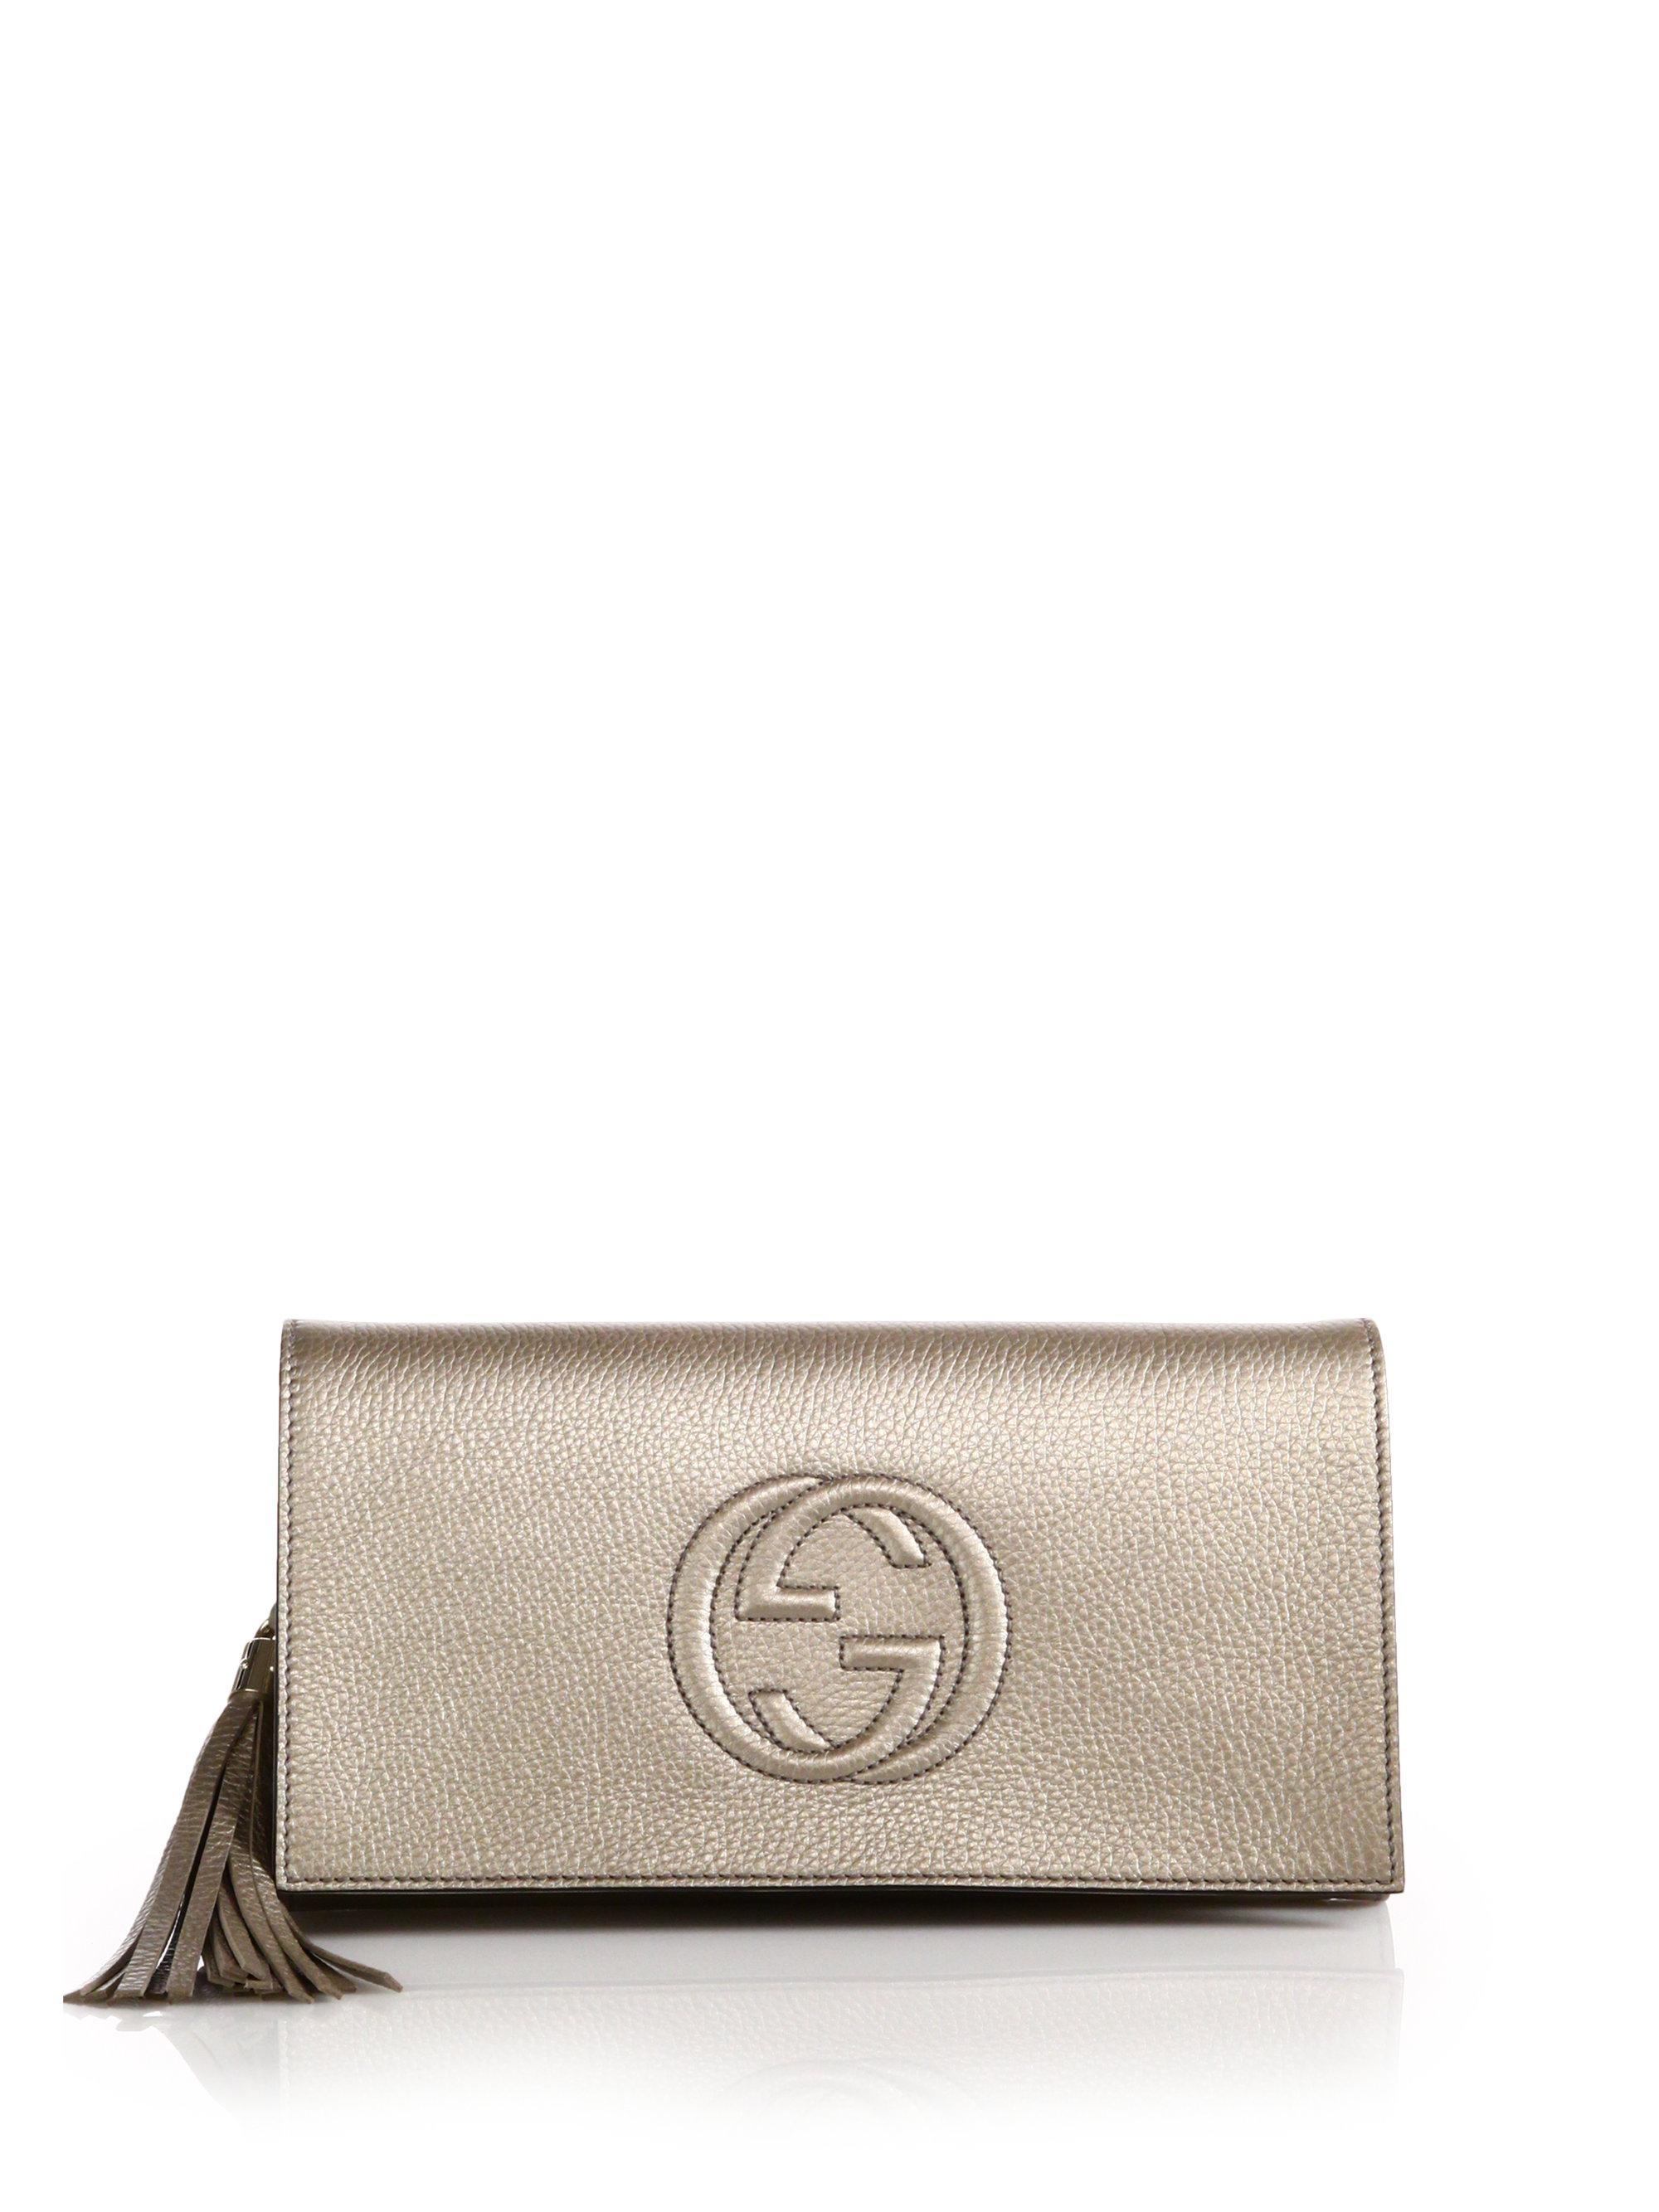 3a7e7e3c6eb Gallery. Previously sold at  Saks Fifth Avenue · Women s Metallic Clutch  Bags Women s Gucci Soho Bag